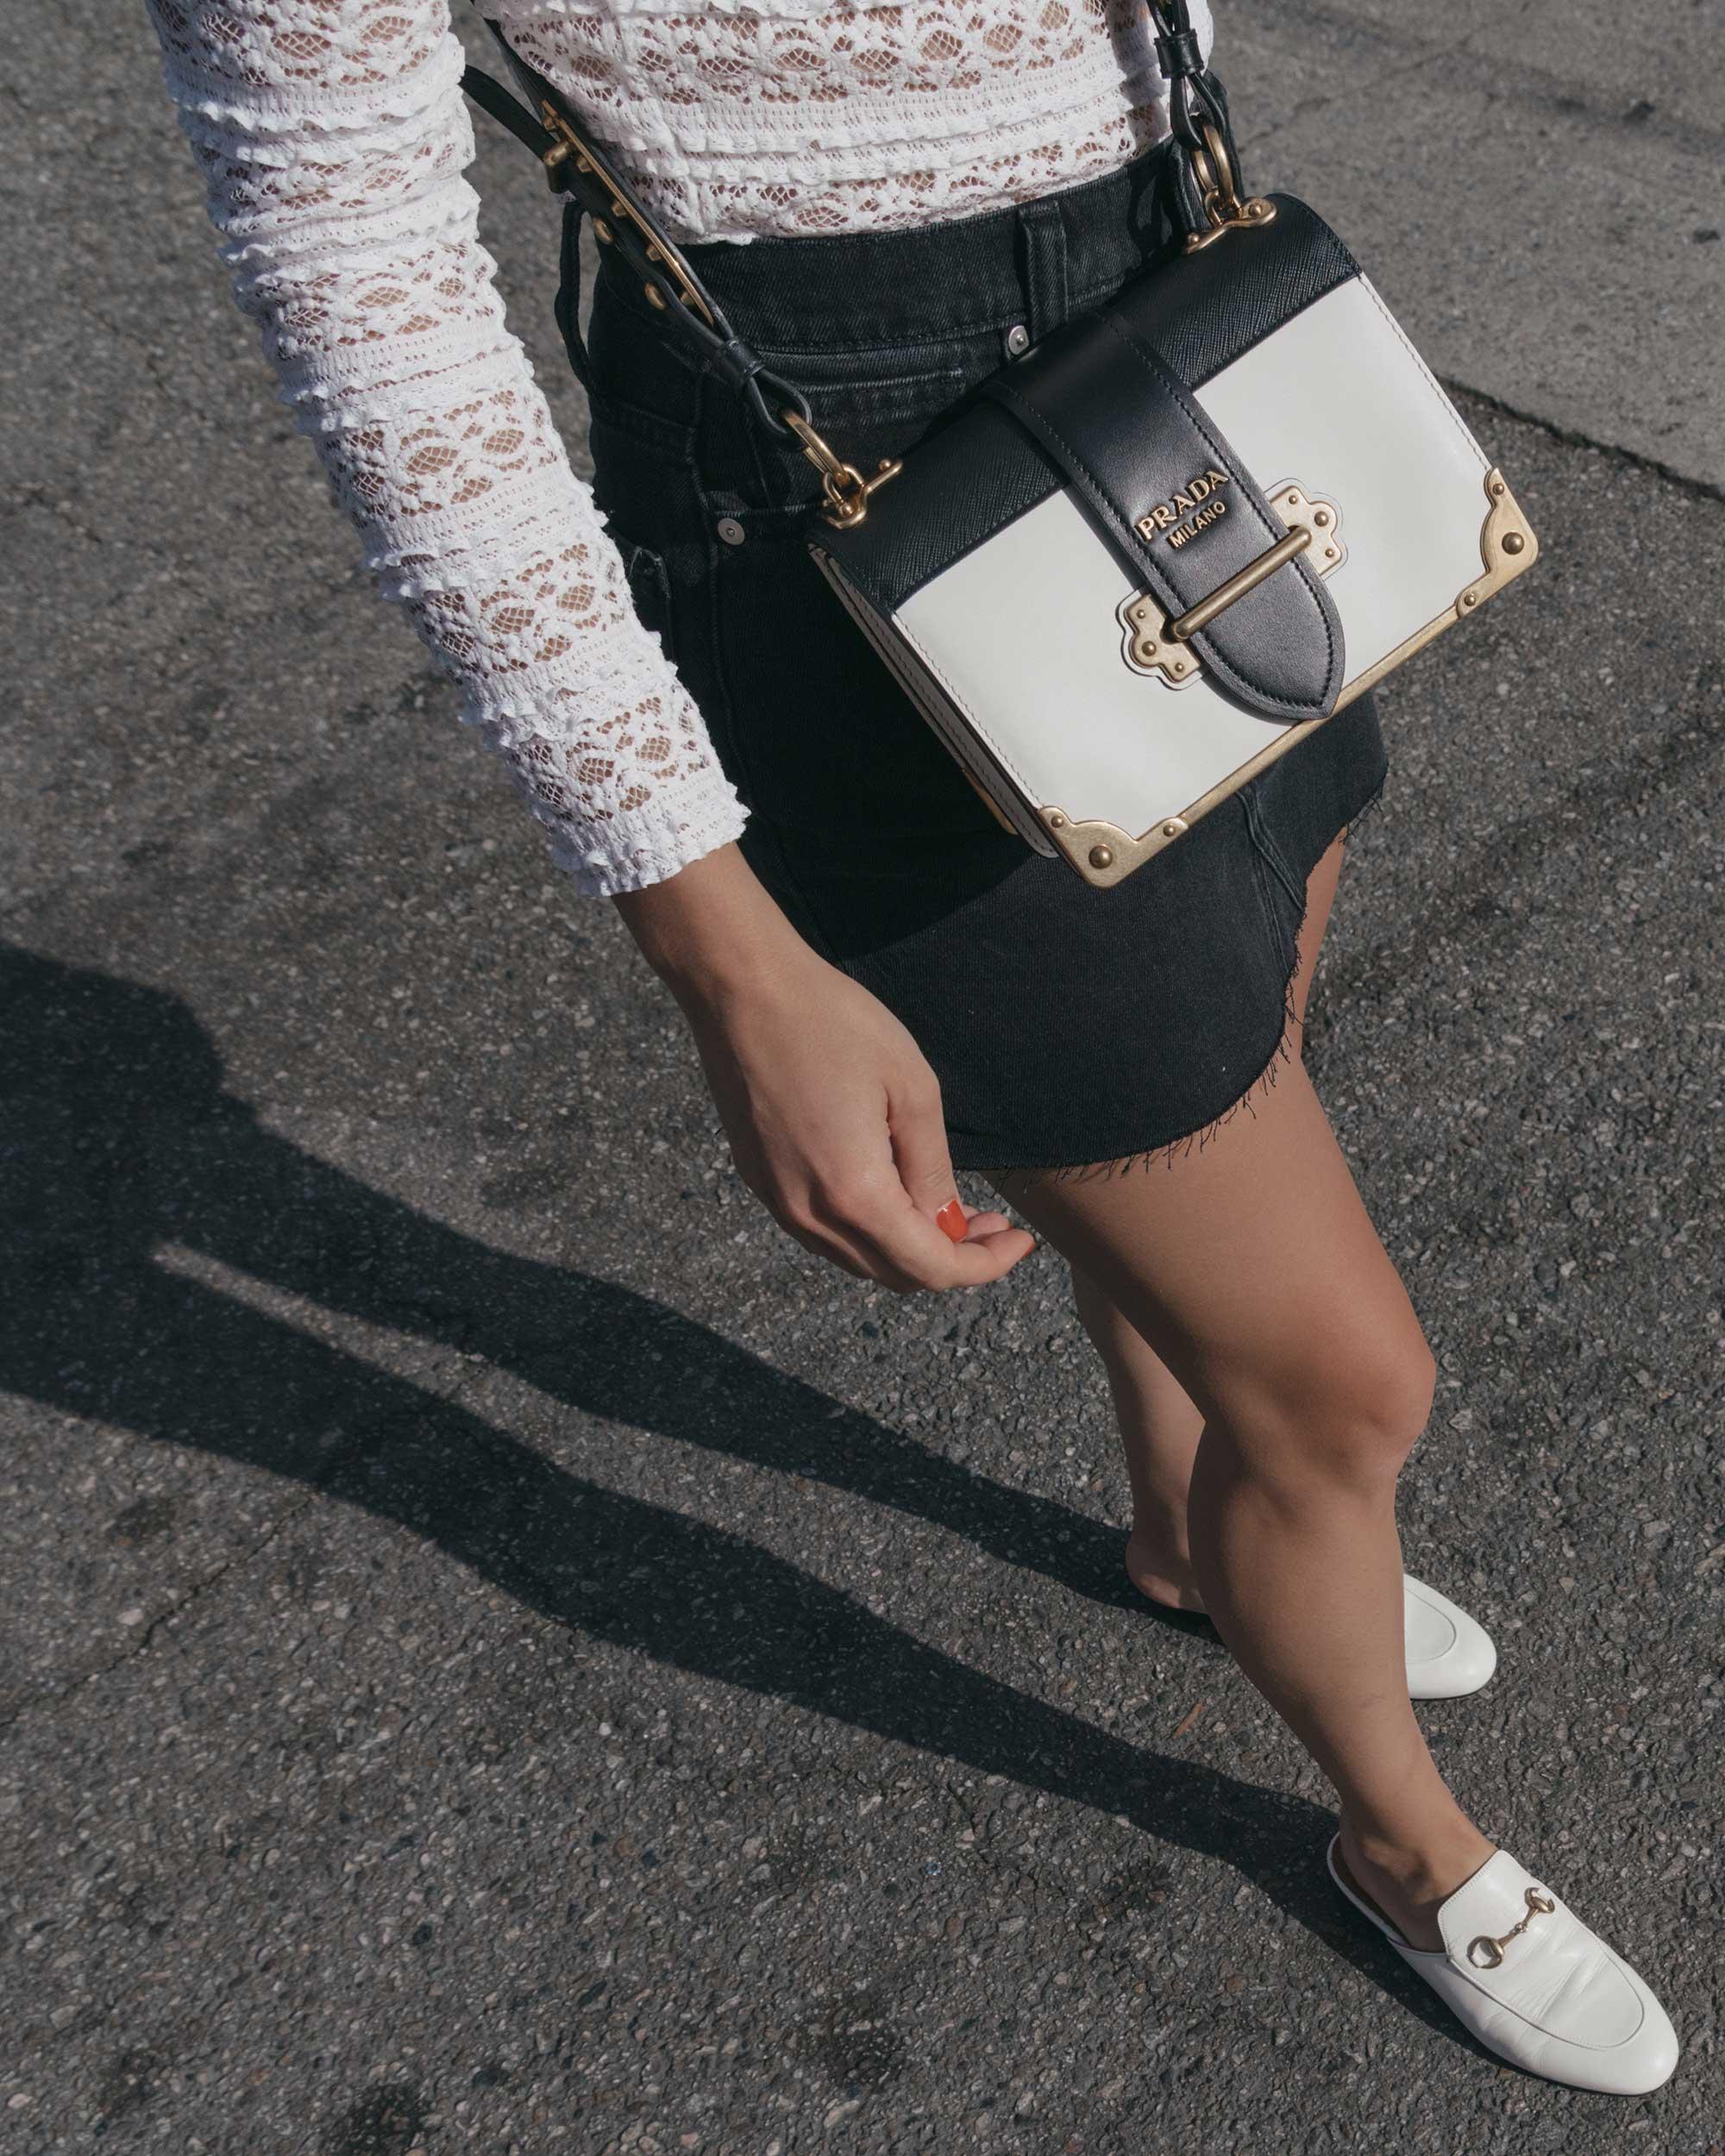 Prada City Saffiano Leather Cahier Bag, Black Denim Skirt, Summer outfit, Abbot Kinney California4.jpg